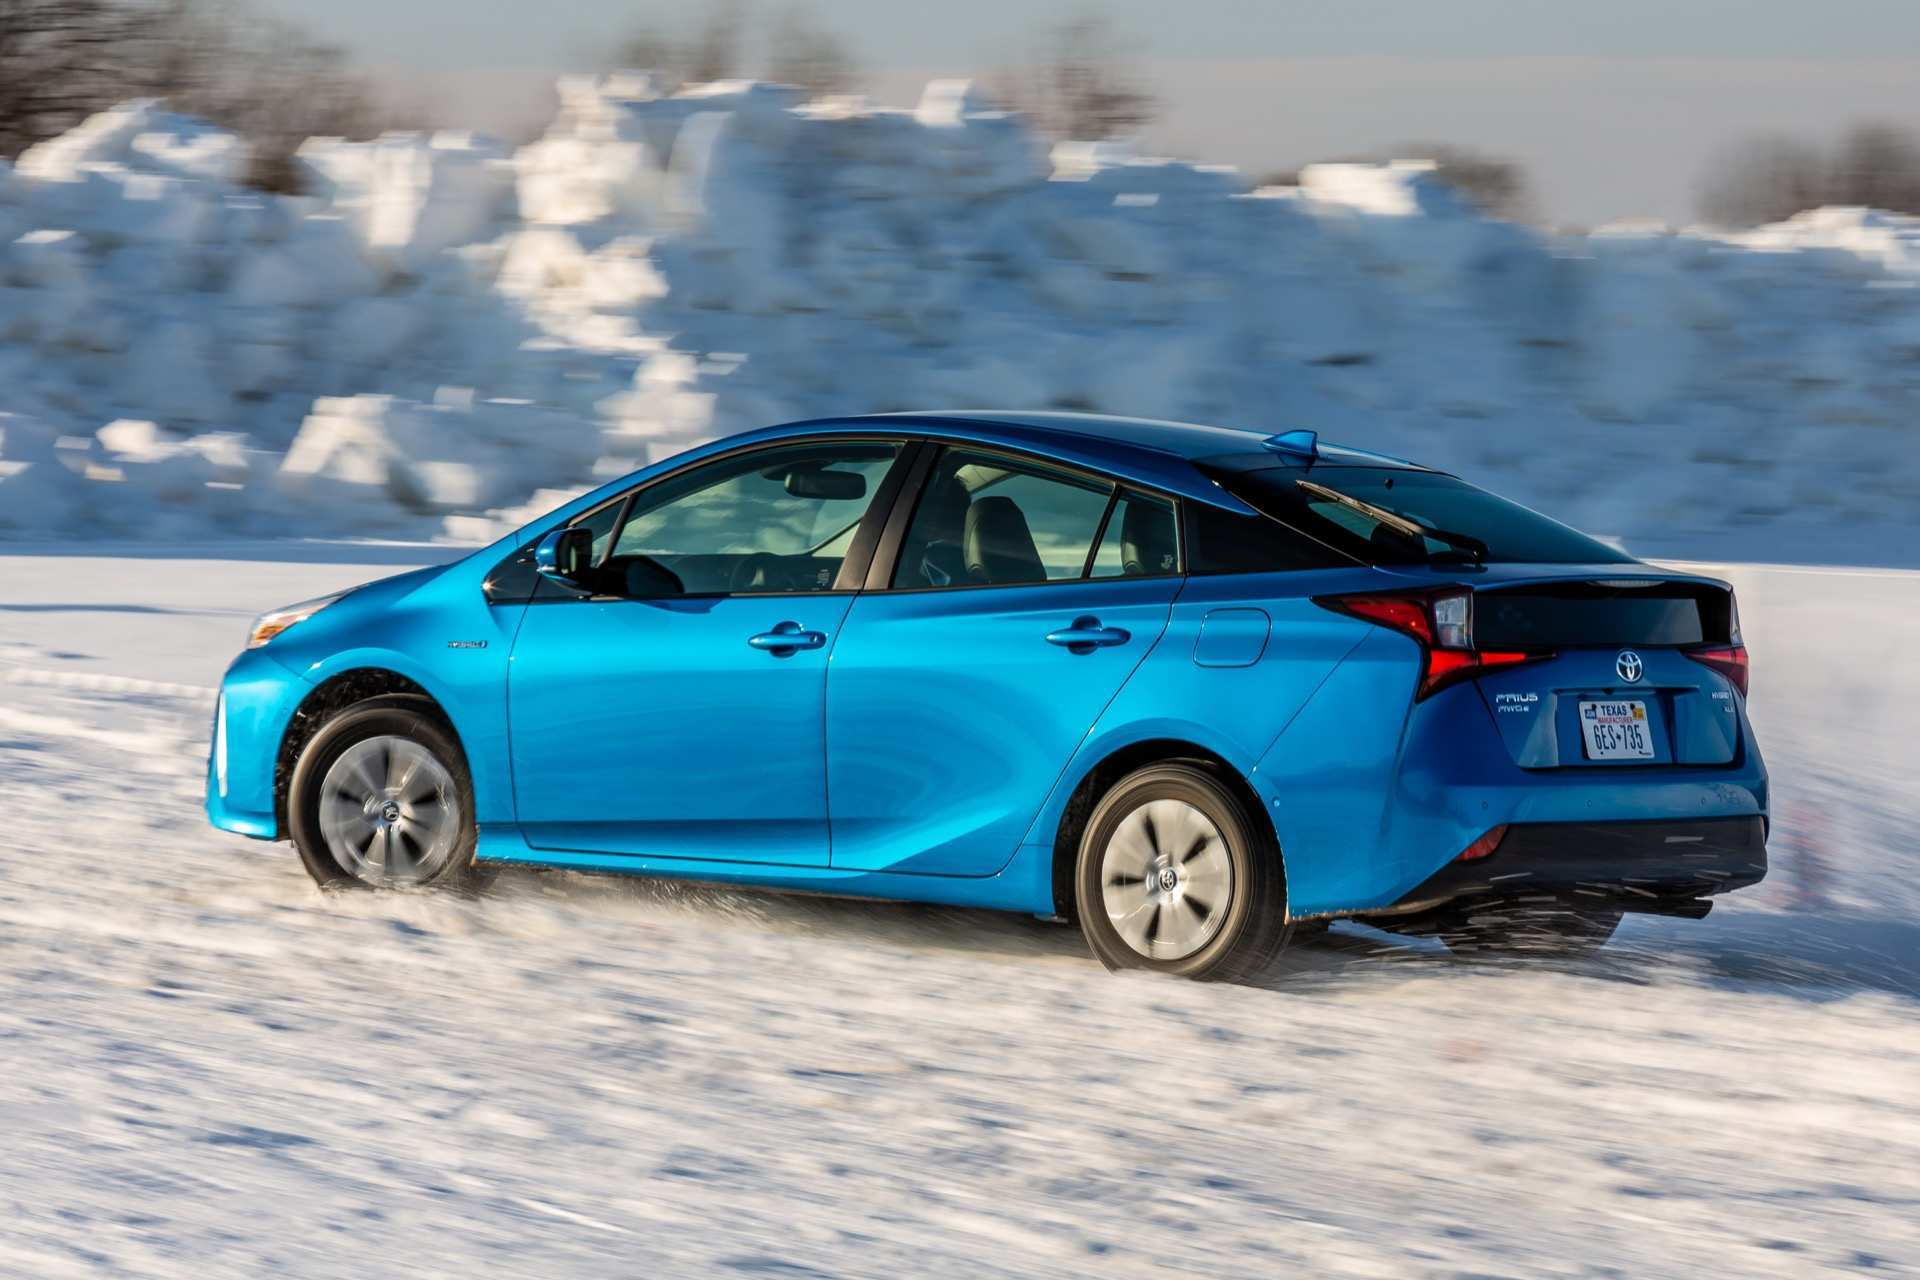 77 New New Plug In Hybrid Toyota 2019 Engine History with New Plug In Hybrid Toyota 2019 Engine